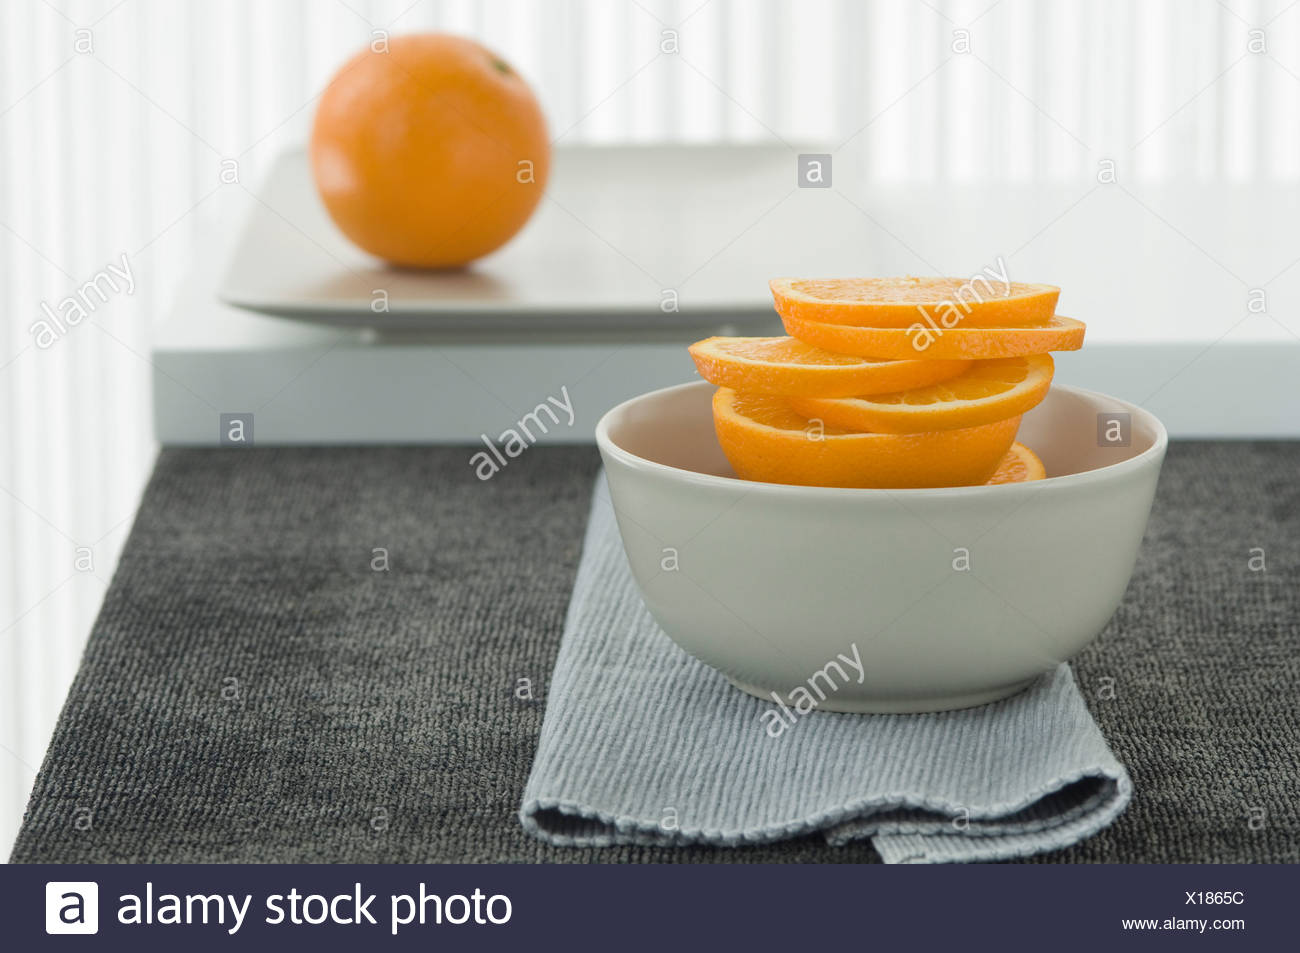 Slices of orange in bowl, close up - Stock Image